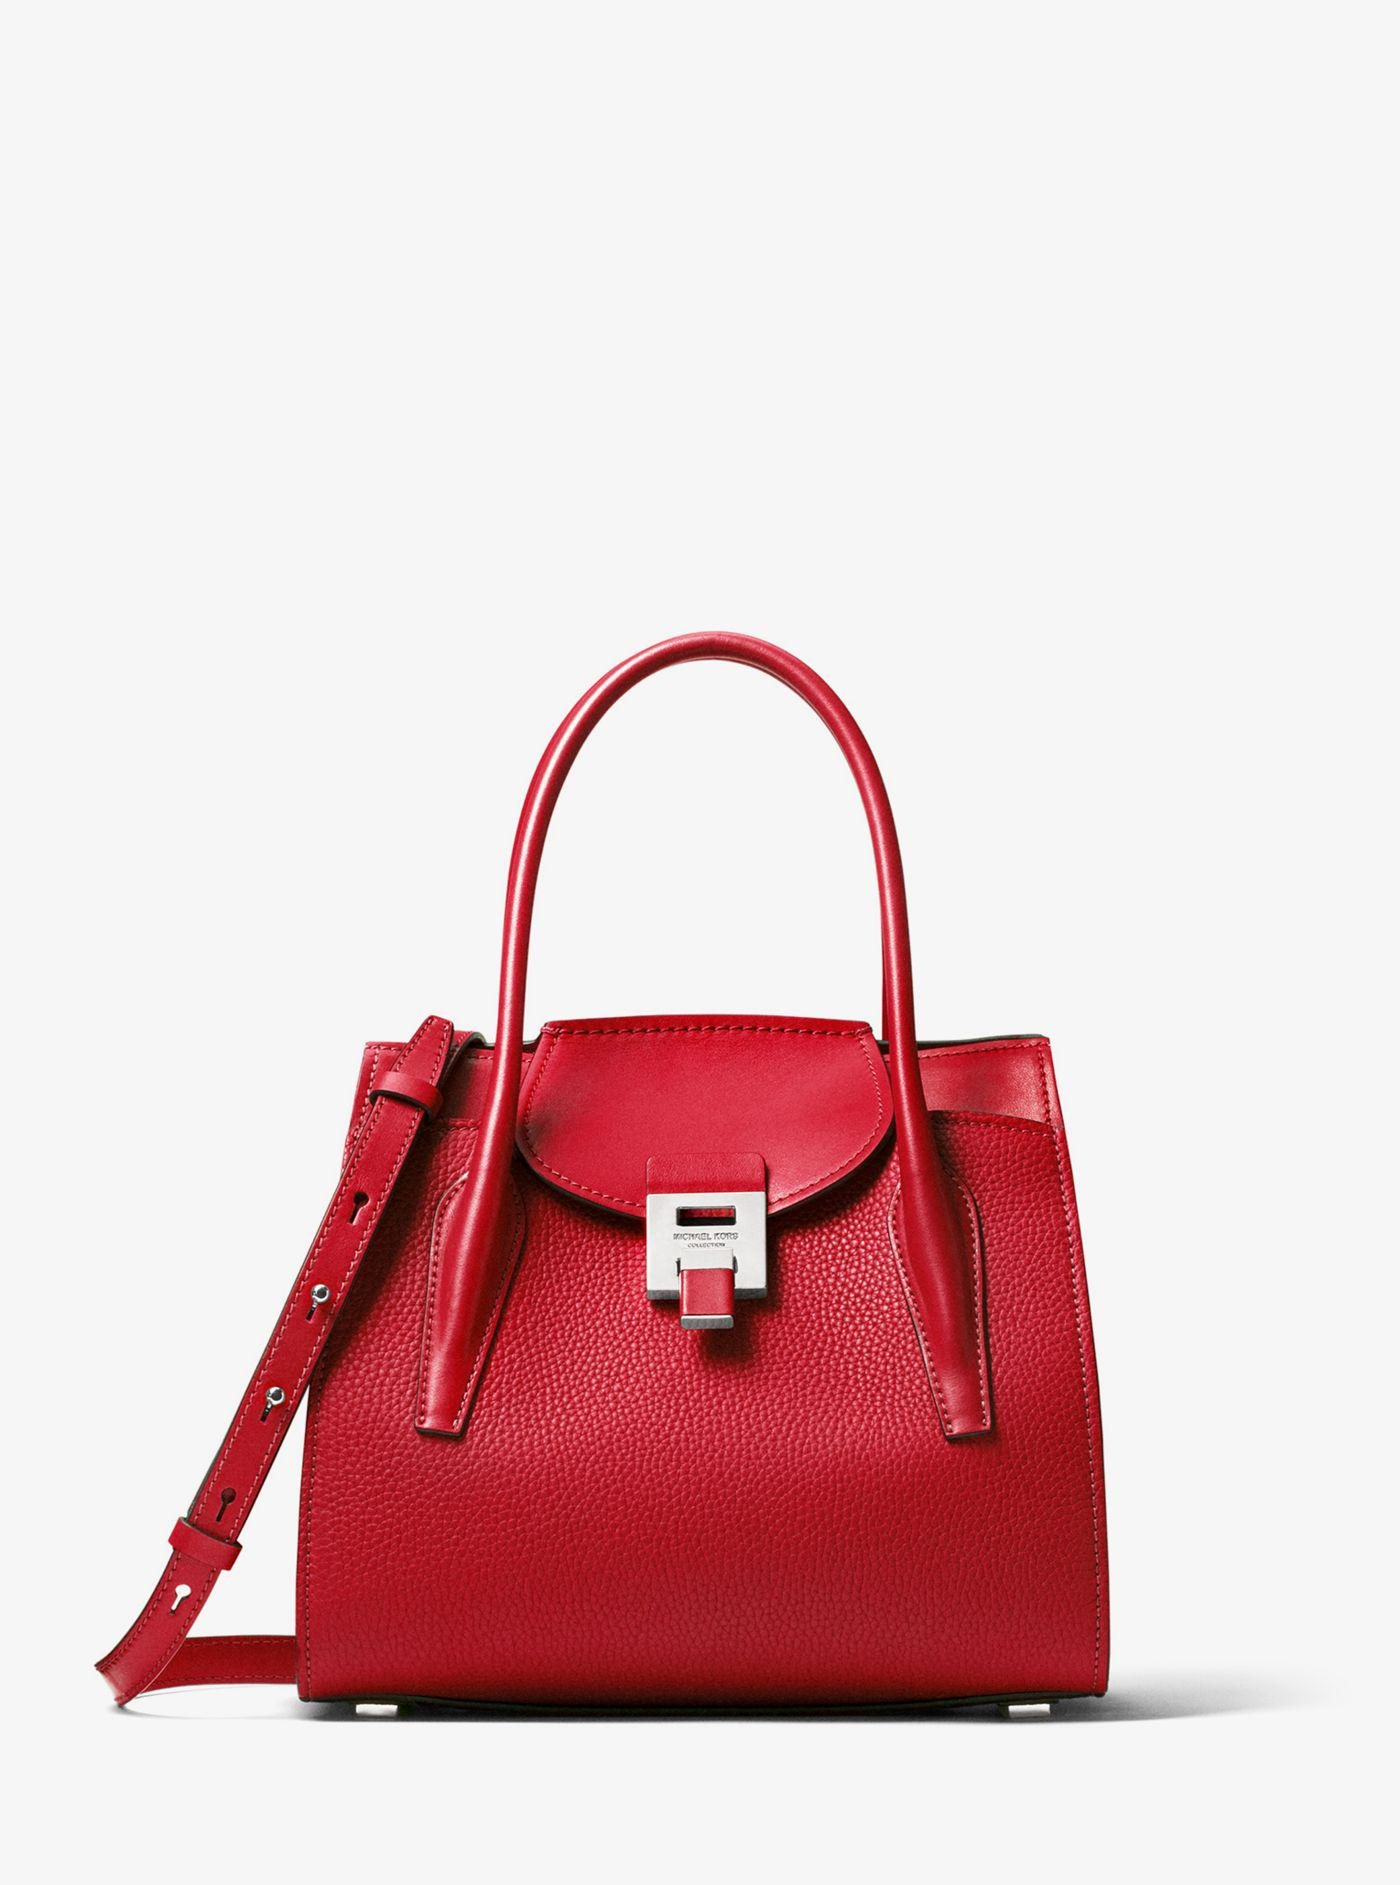 de0df4d0ef2ad Michael Kors Bancroft Medium Pebbled Calf Leather Satchel in Red - Lyst